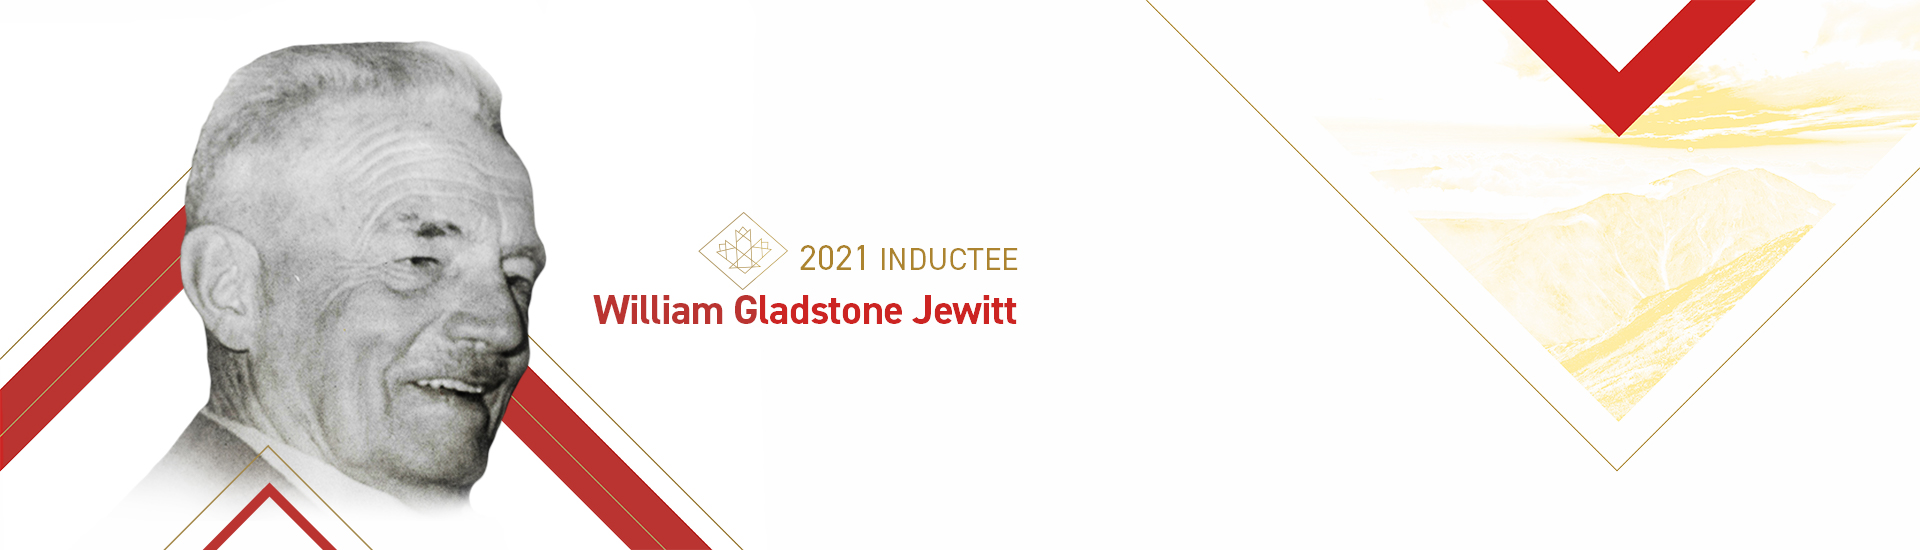 William Gladstone Jewitt (1897 – 1978)